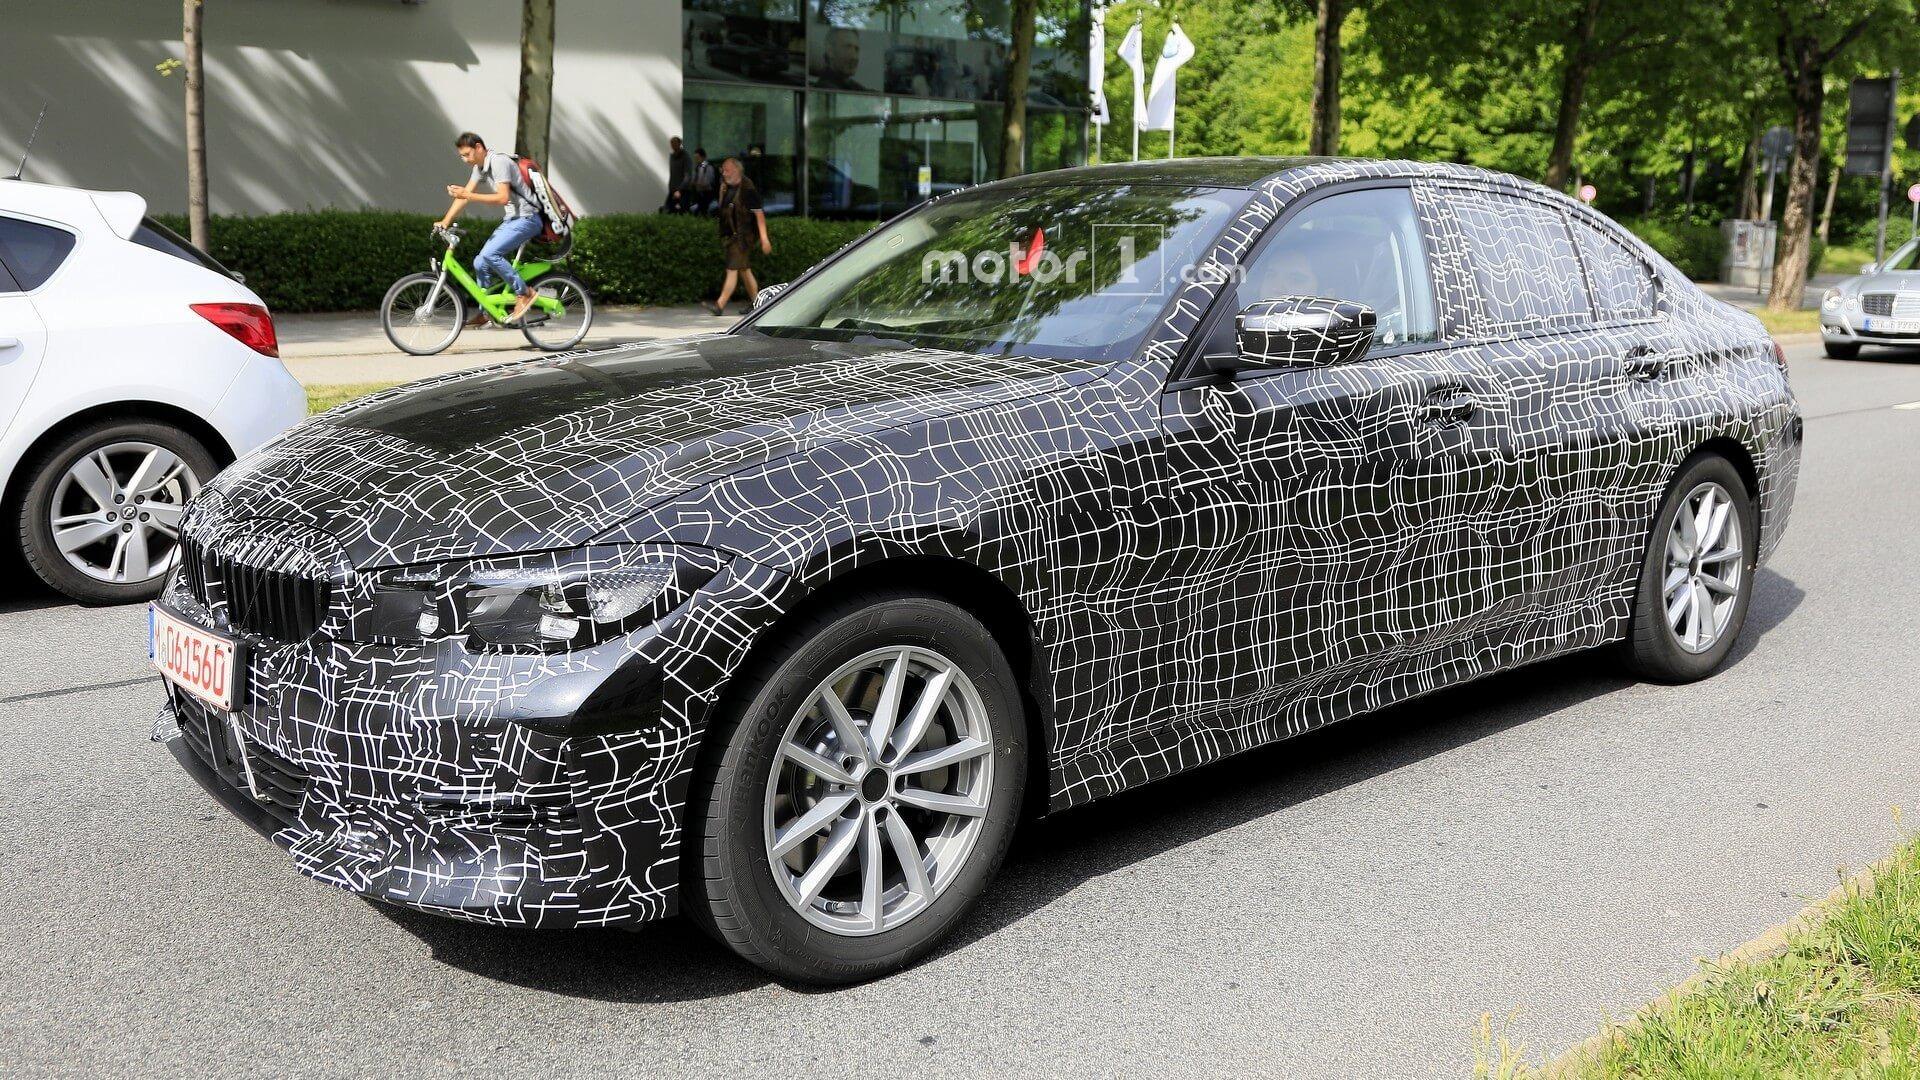 Bmw Serie 3 G20 >> 2019 7th Generation BMW 3 Series (G20) - Conti Talk - MyCarForum.com